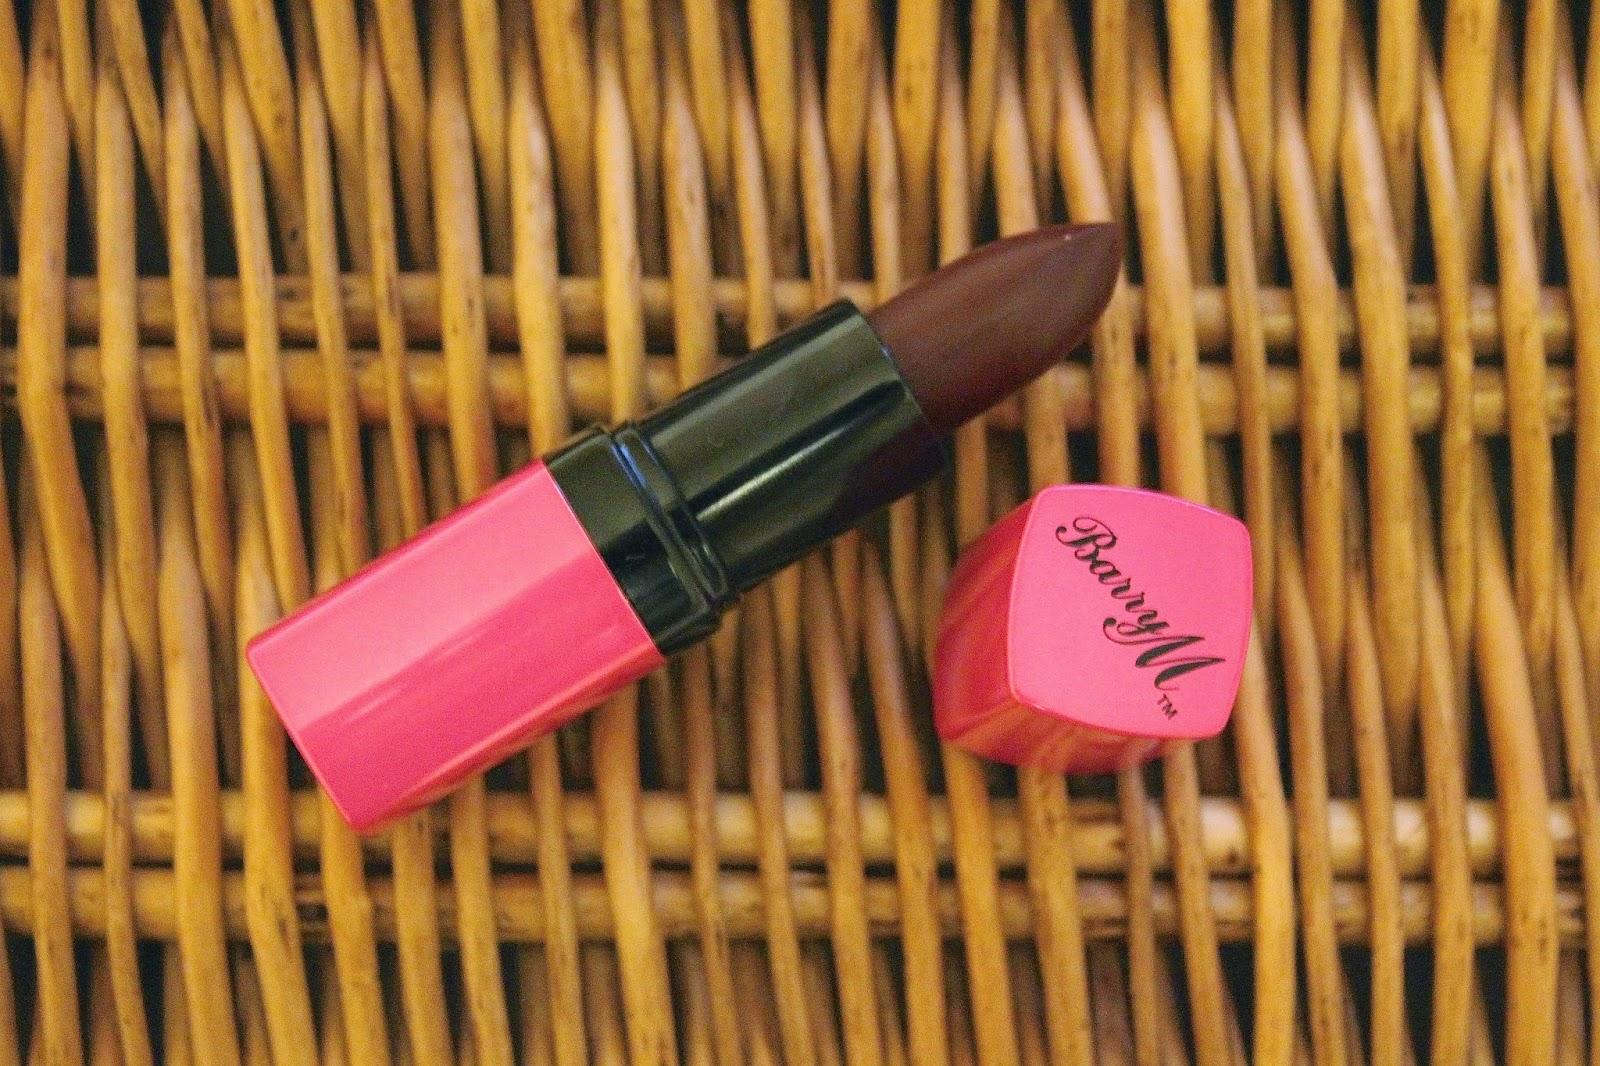 barry m lipstick